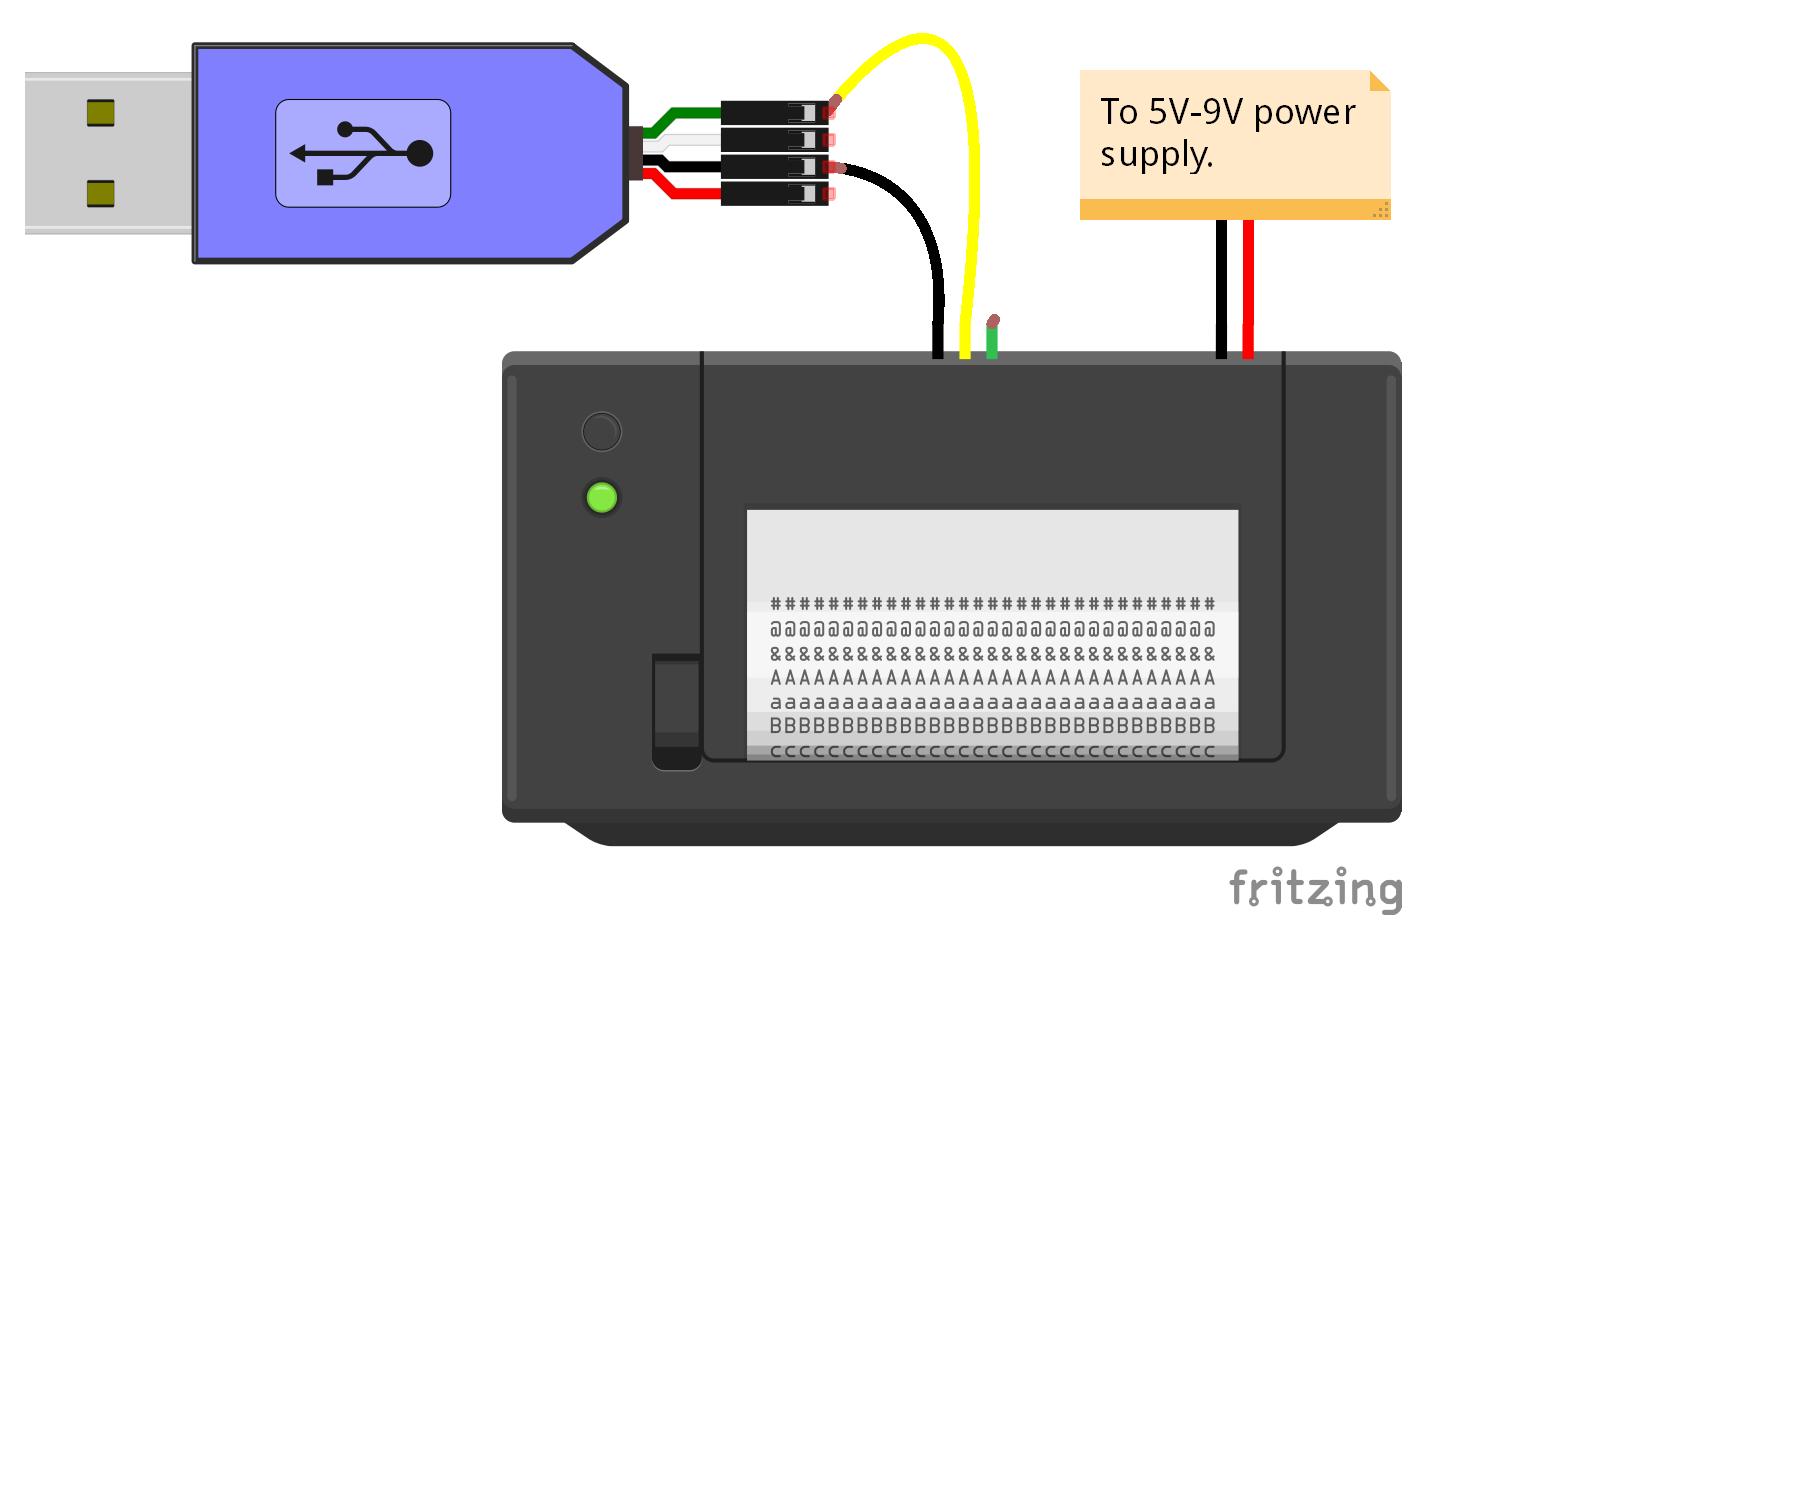 components_pi_thermal_printer_usb_bb.png